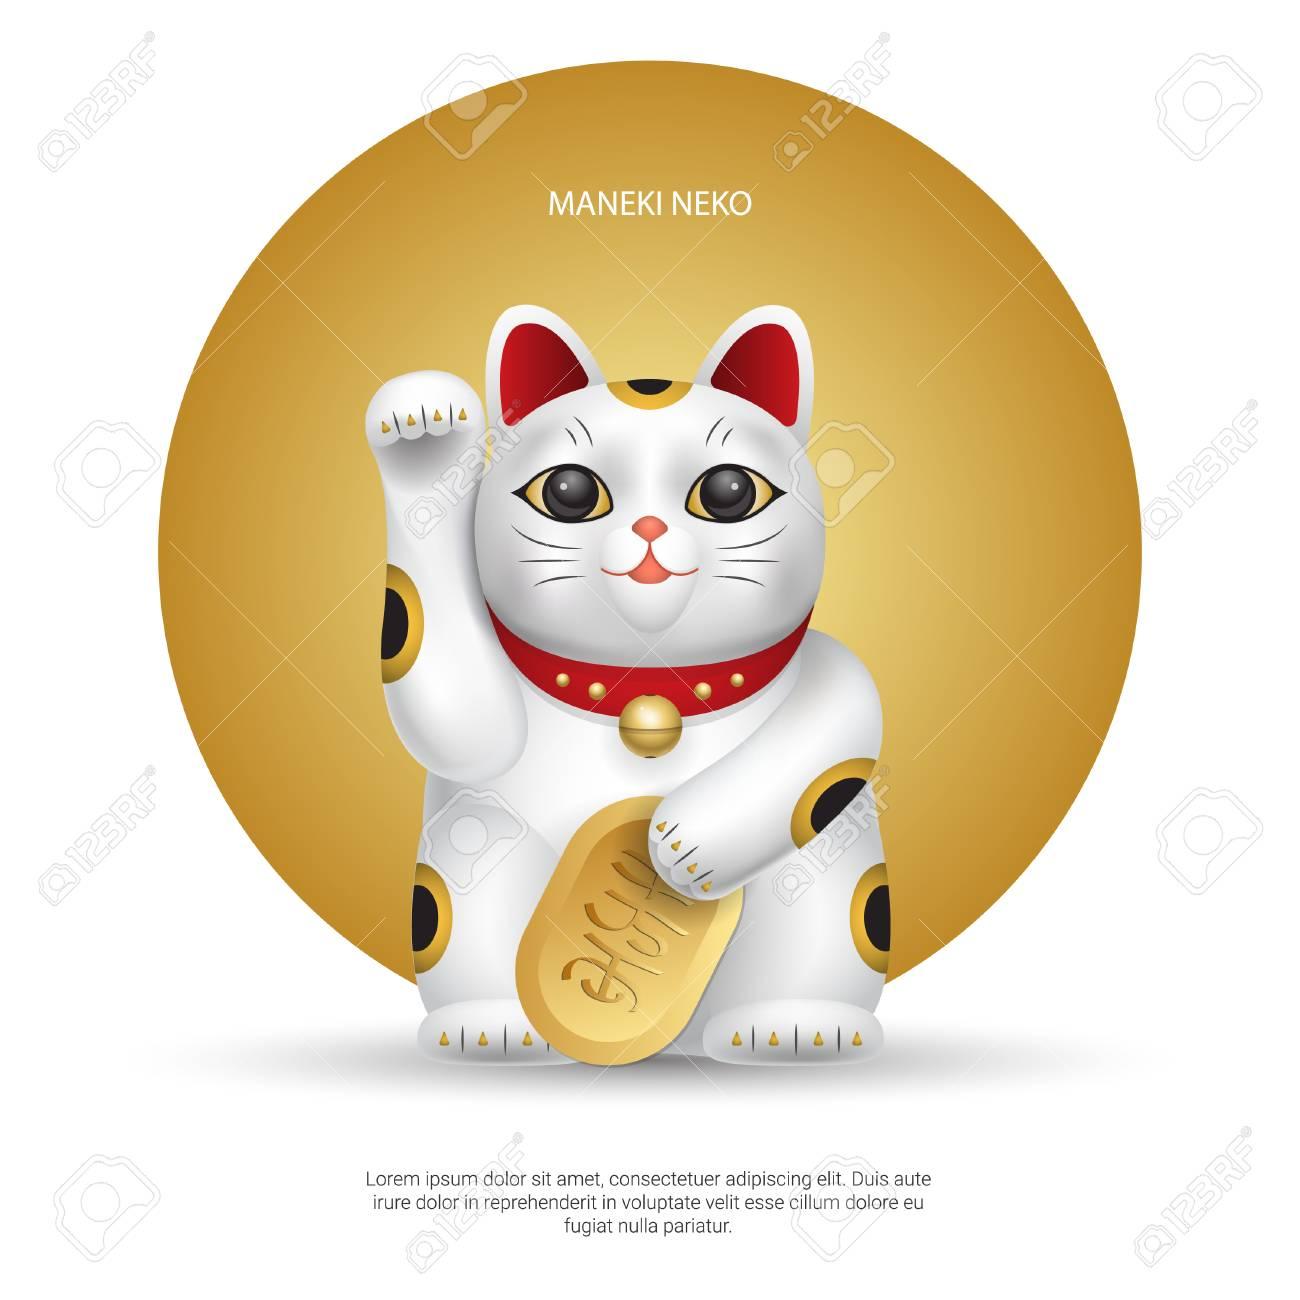 Realistic vector Maneki-neko, lucky japan cat on background with gold circle. - 111101427